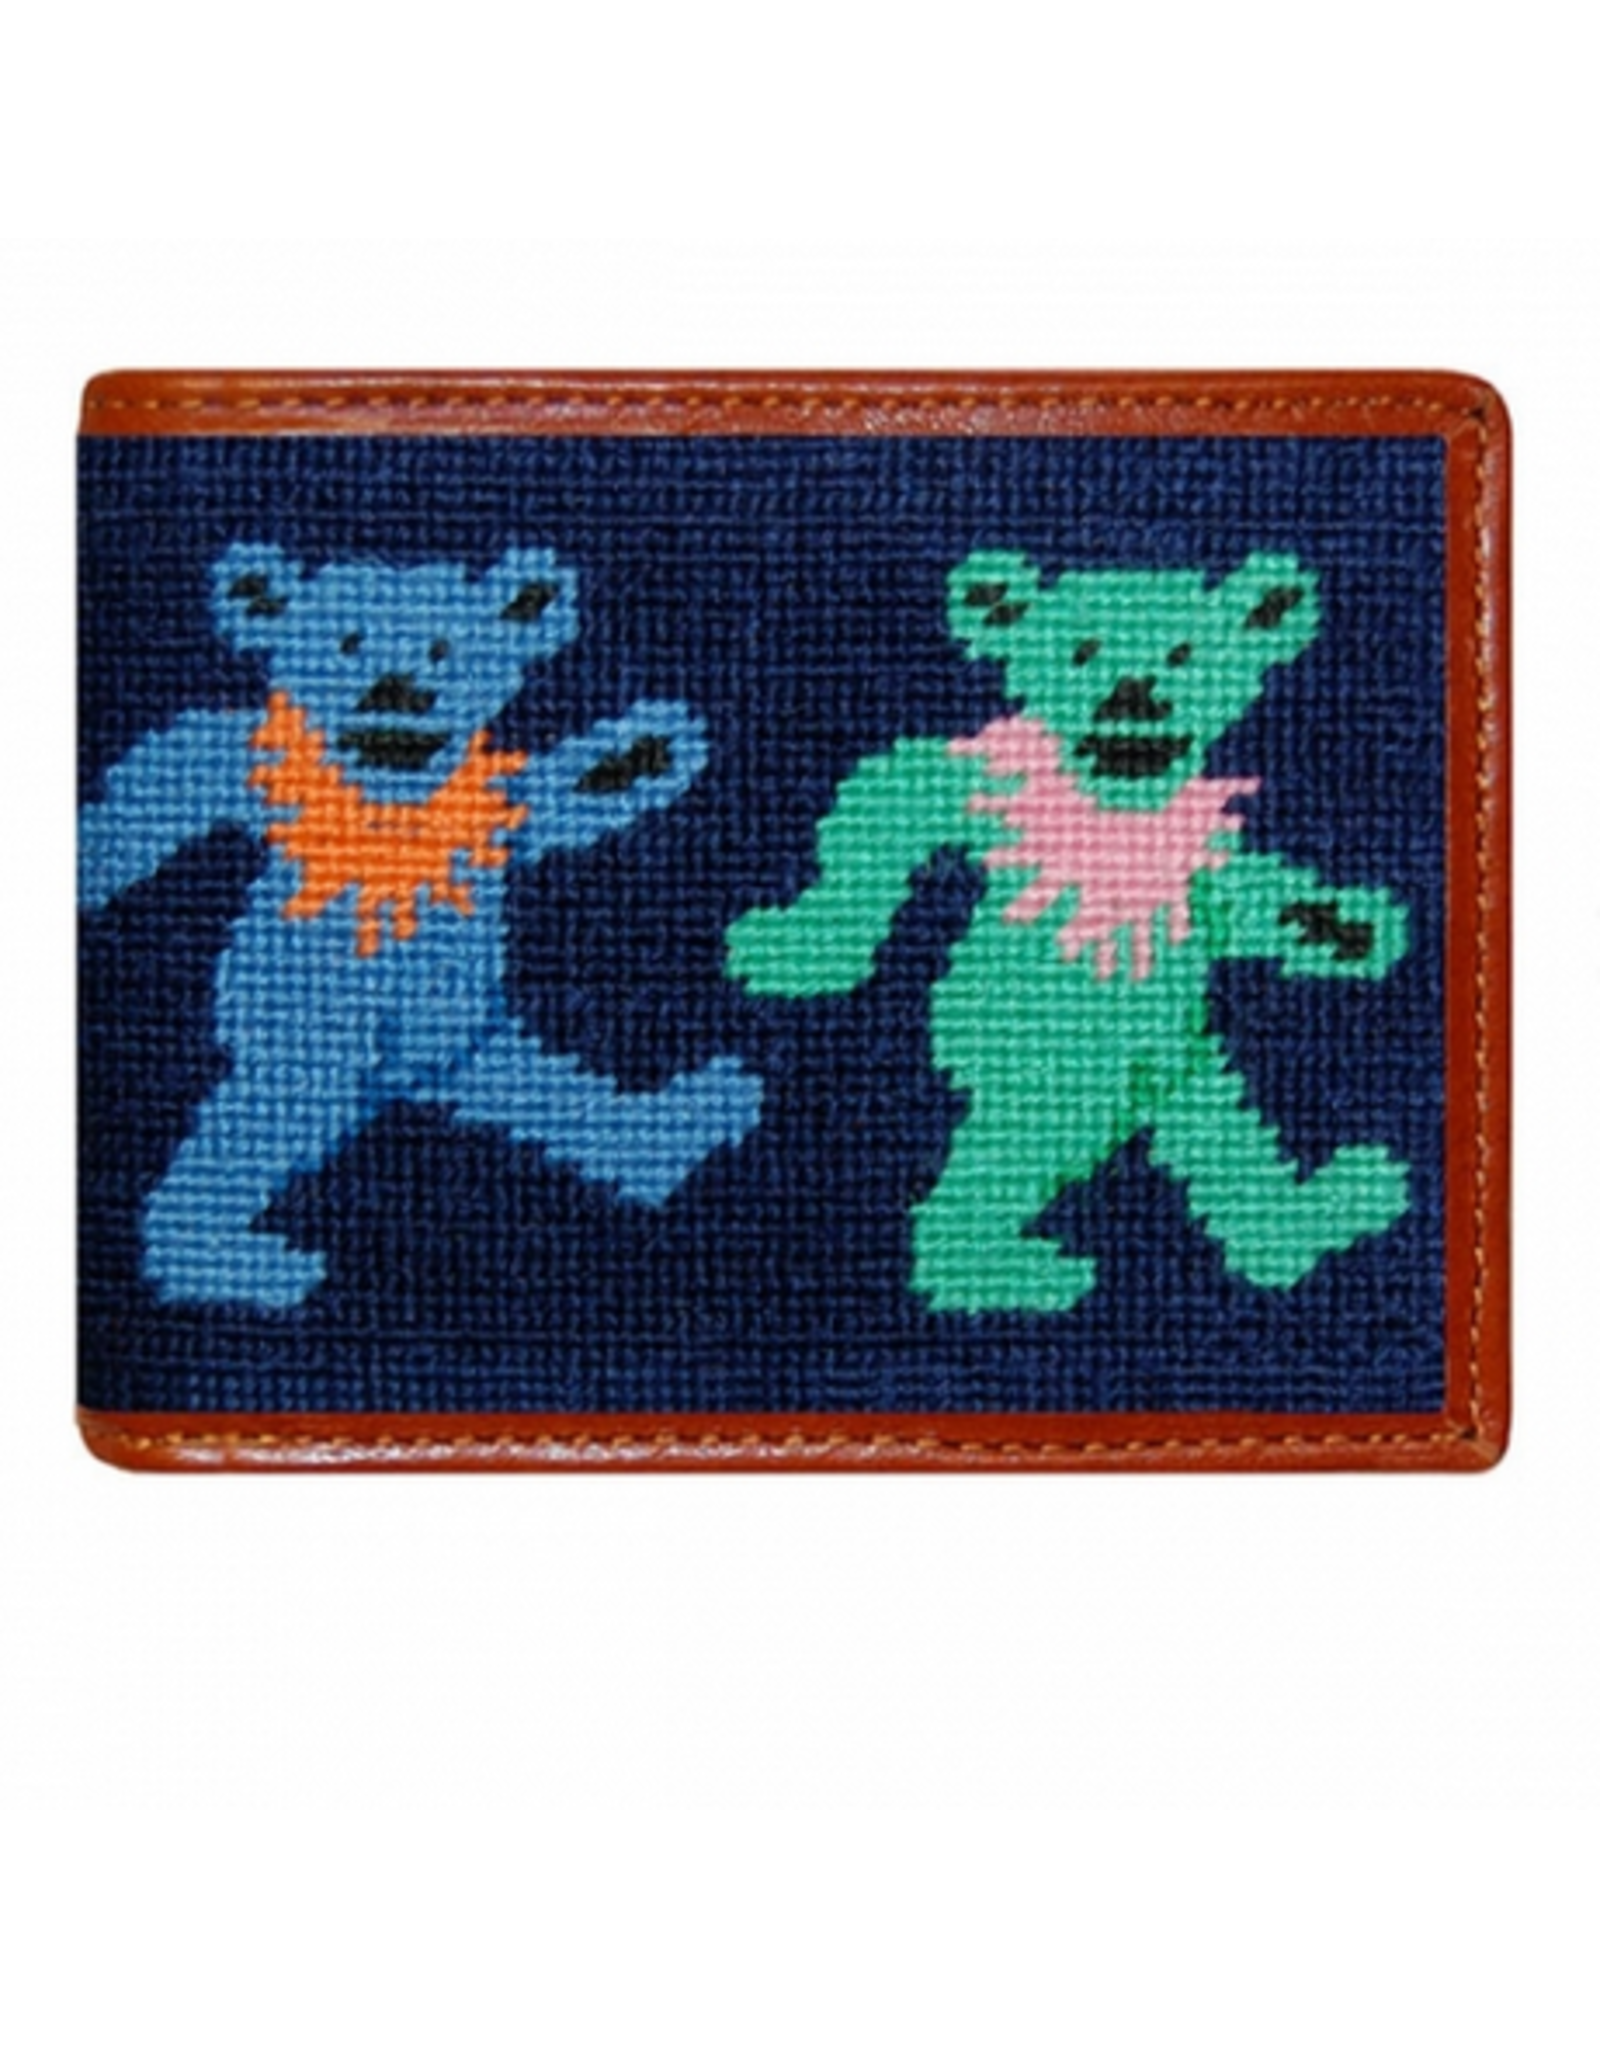 Smathers & Branson S&B Needlepoint Bi-fold Wallet, Dancing Bears